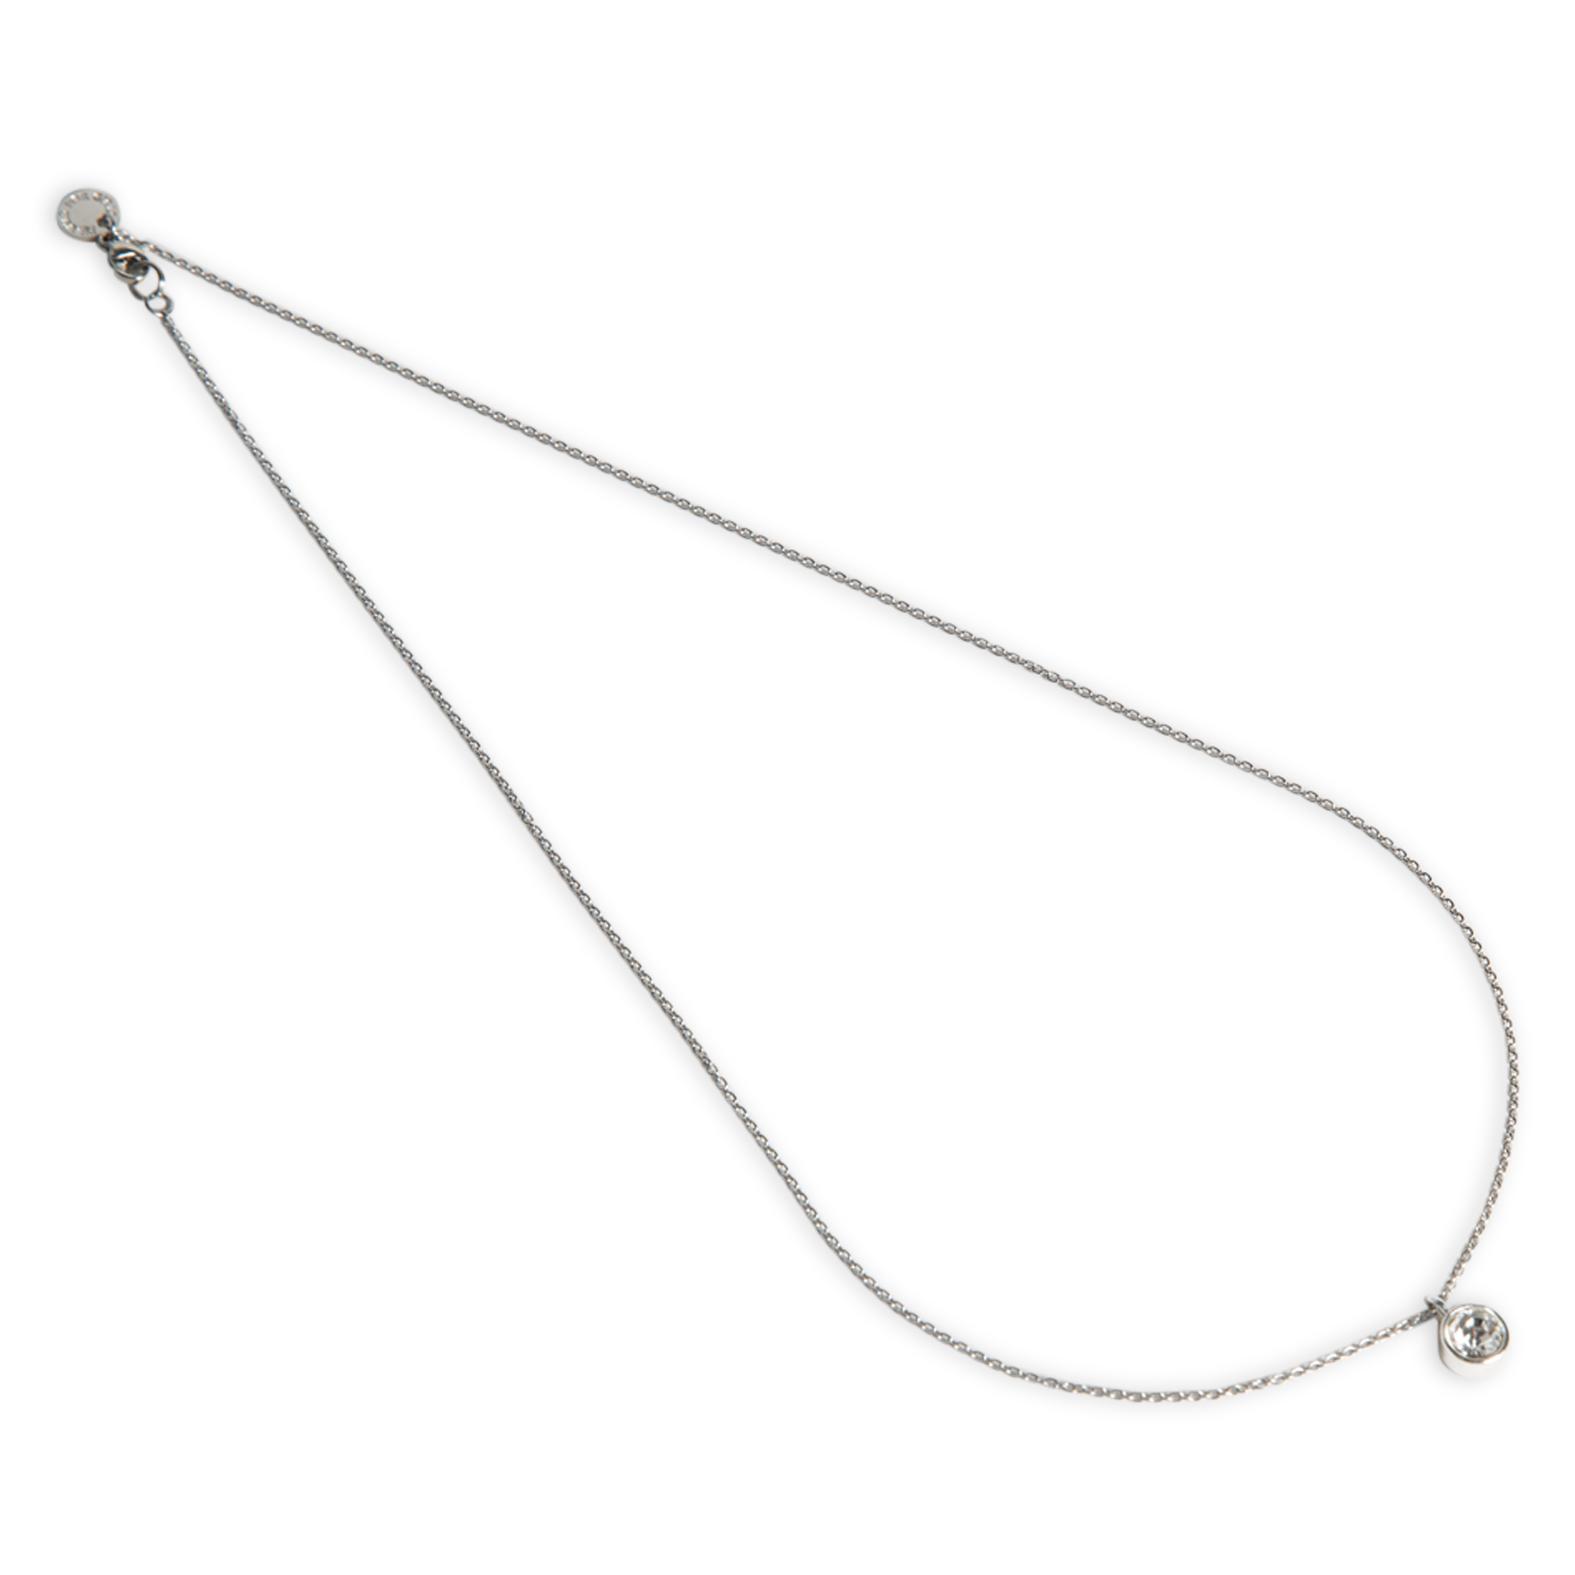 Damsmycke pfg Stockholm Pearls for Girls-Lisa Necklace 50 cm 90884-02